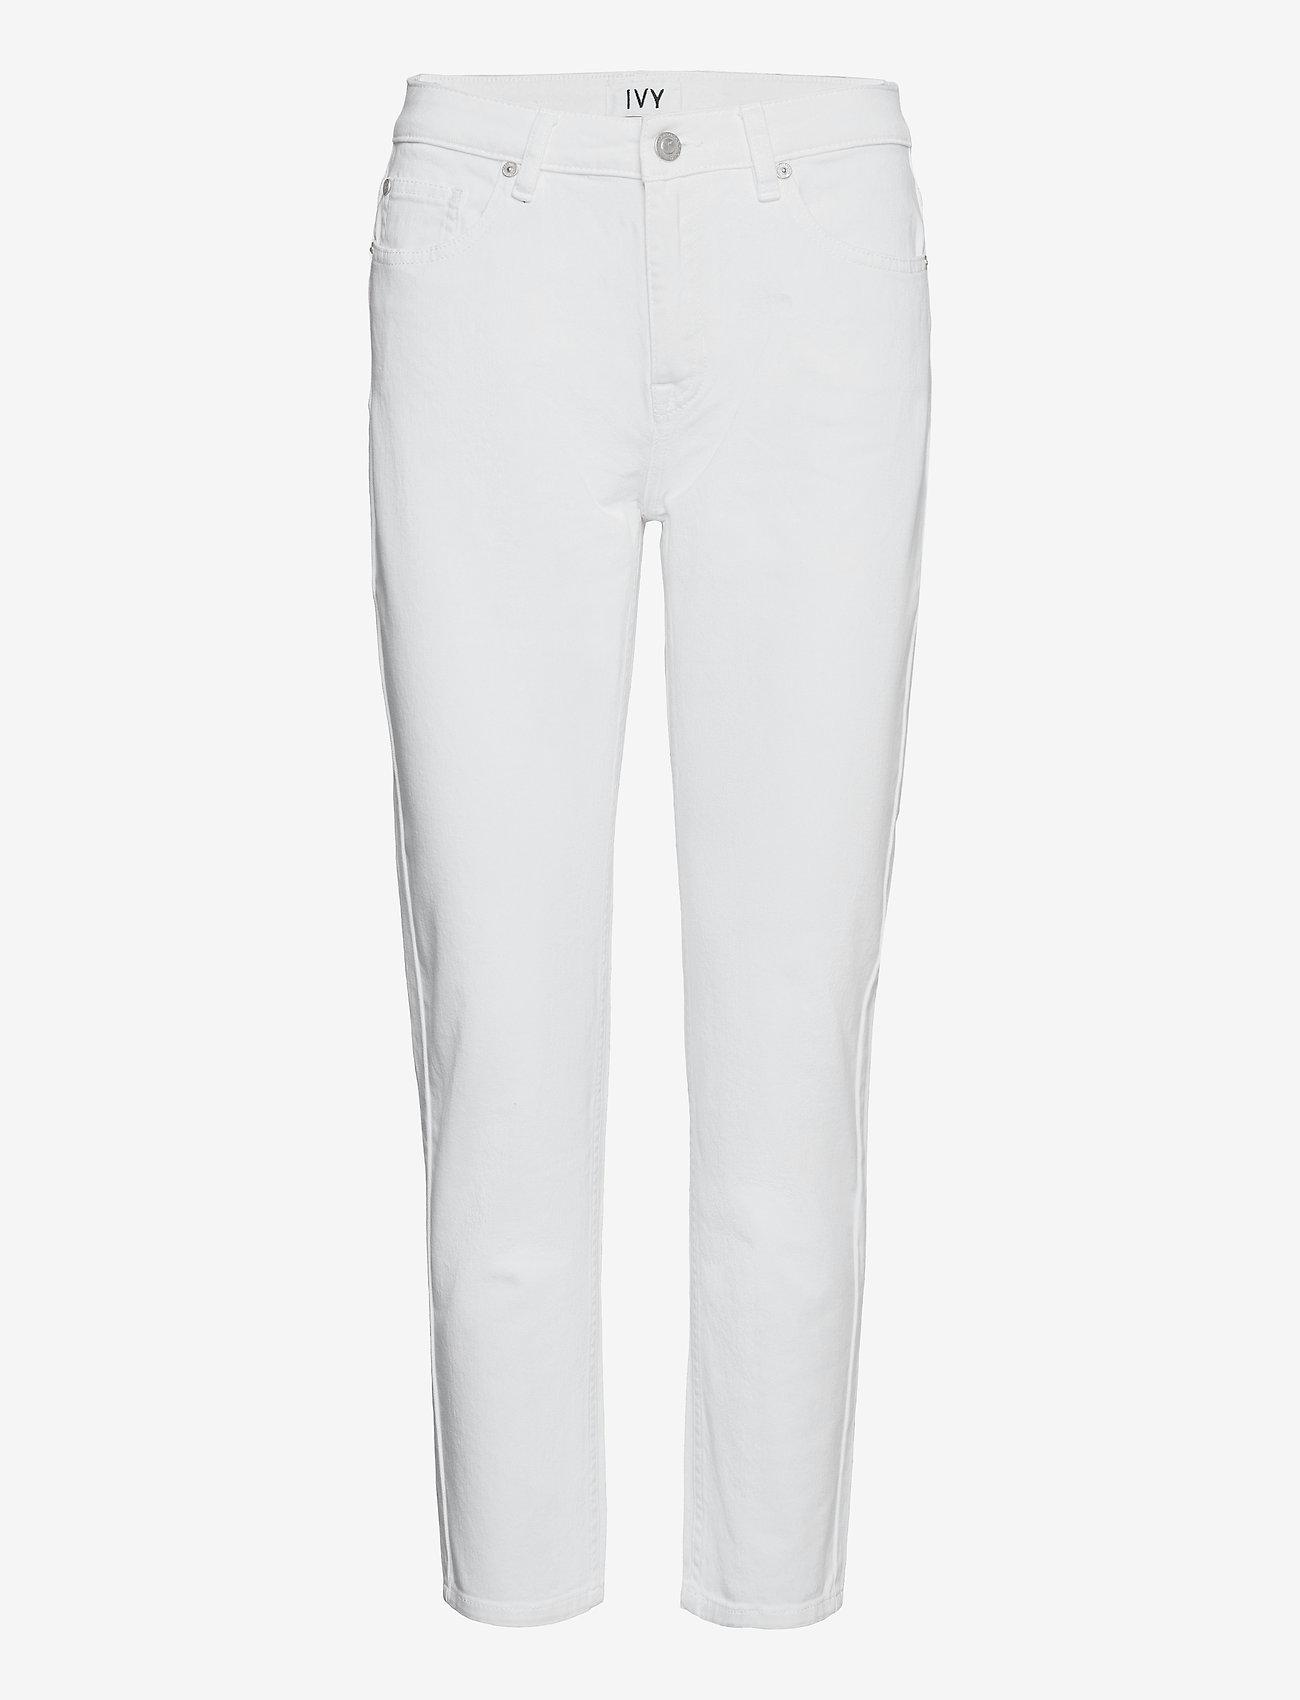 IVY Copenhagen - Lavina MOM white - chinos - white - 0